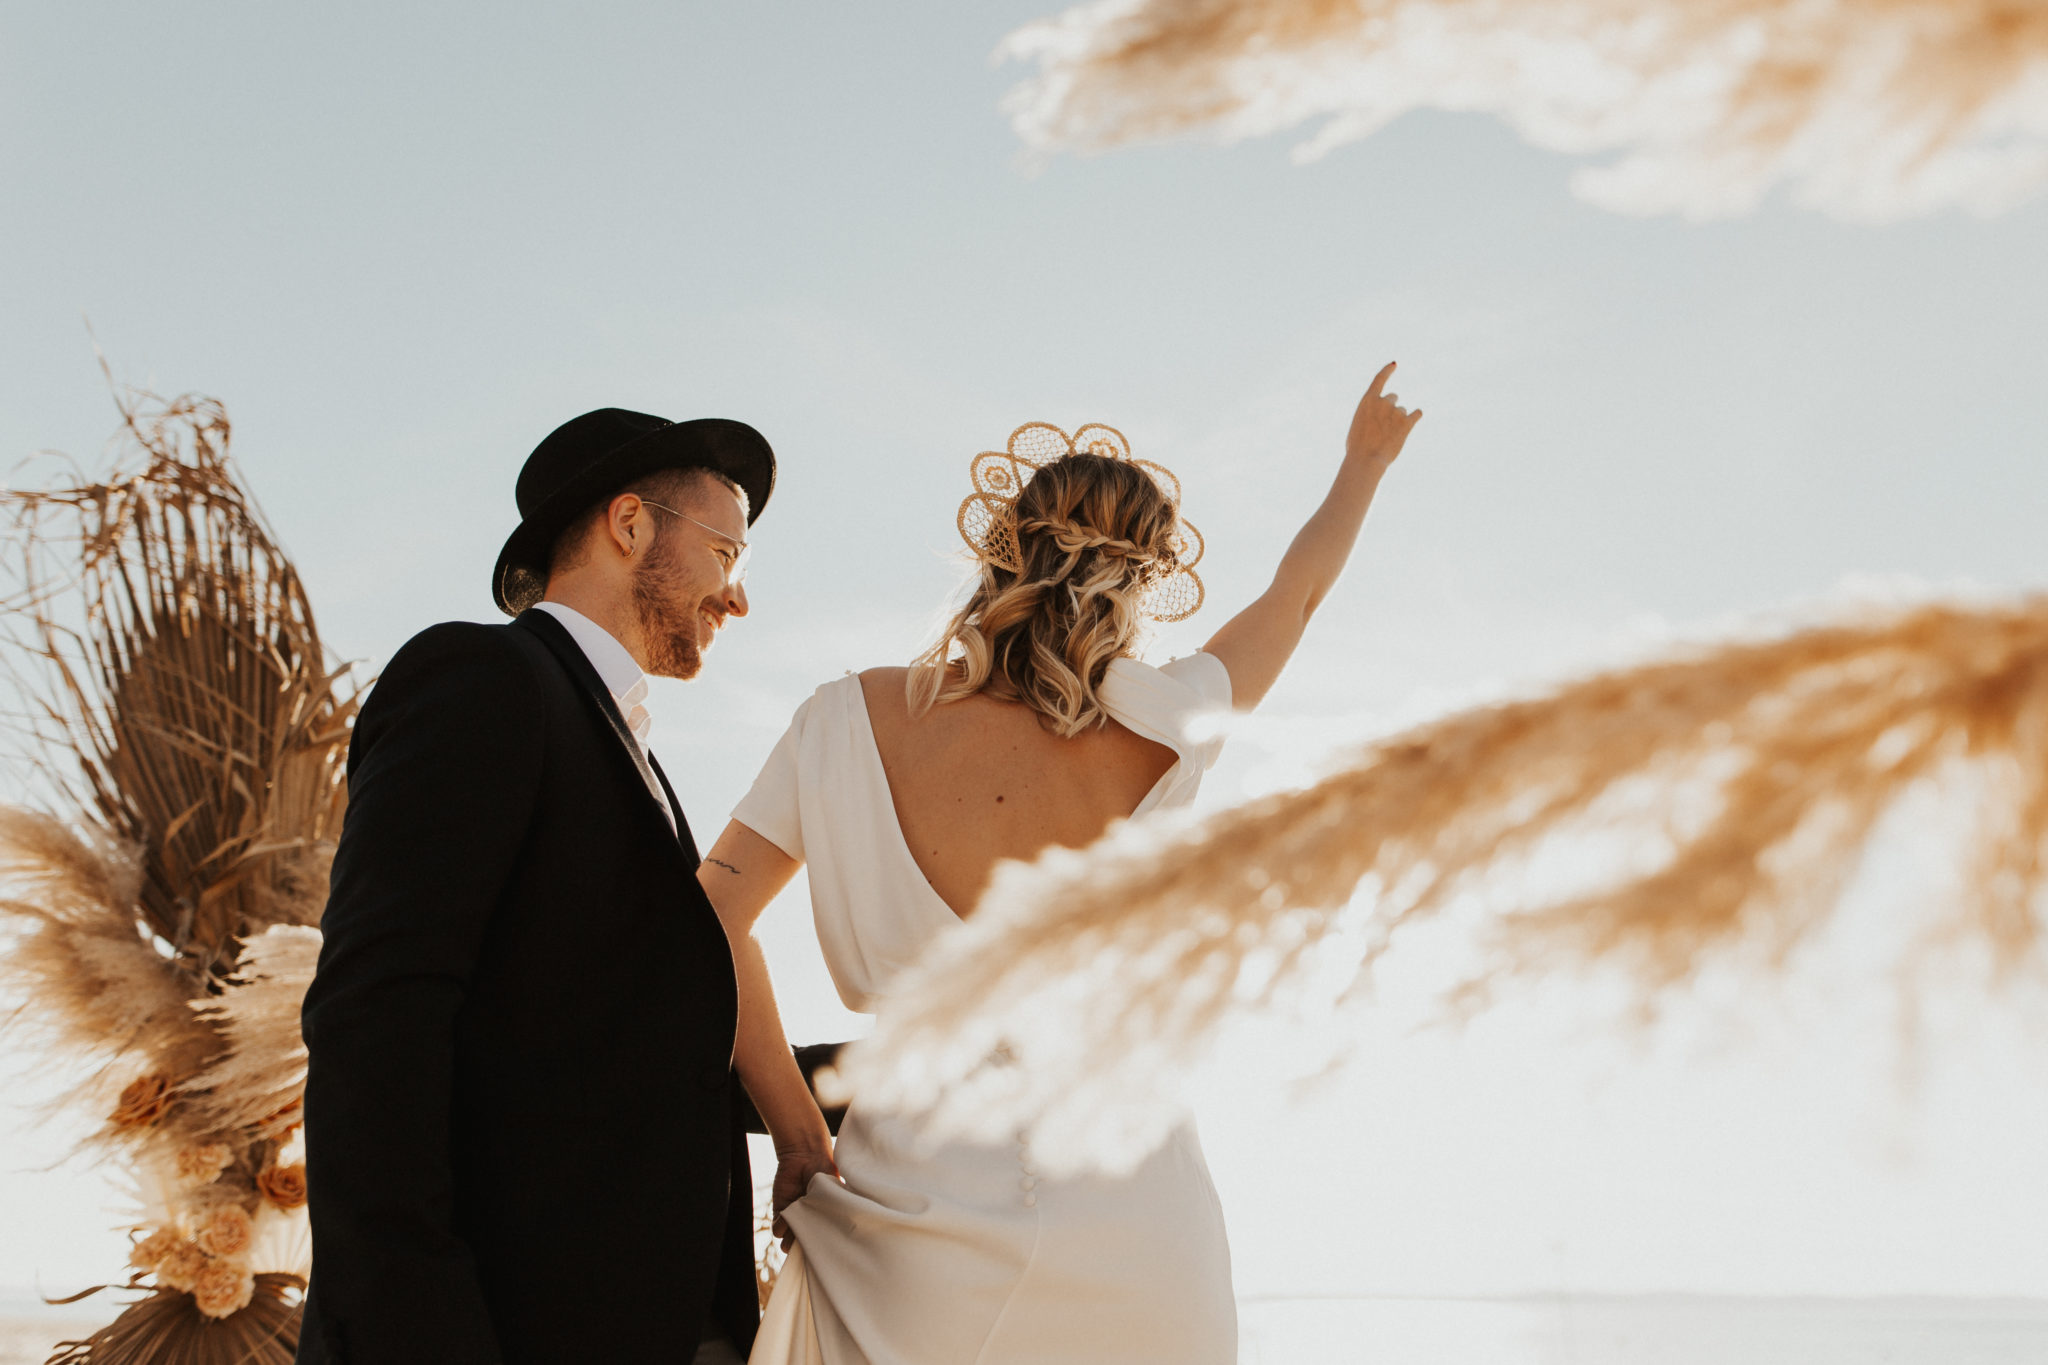 bassin-arcachon-mariage-inspiration-couple-pampa